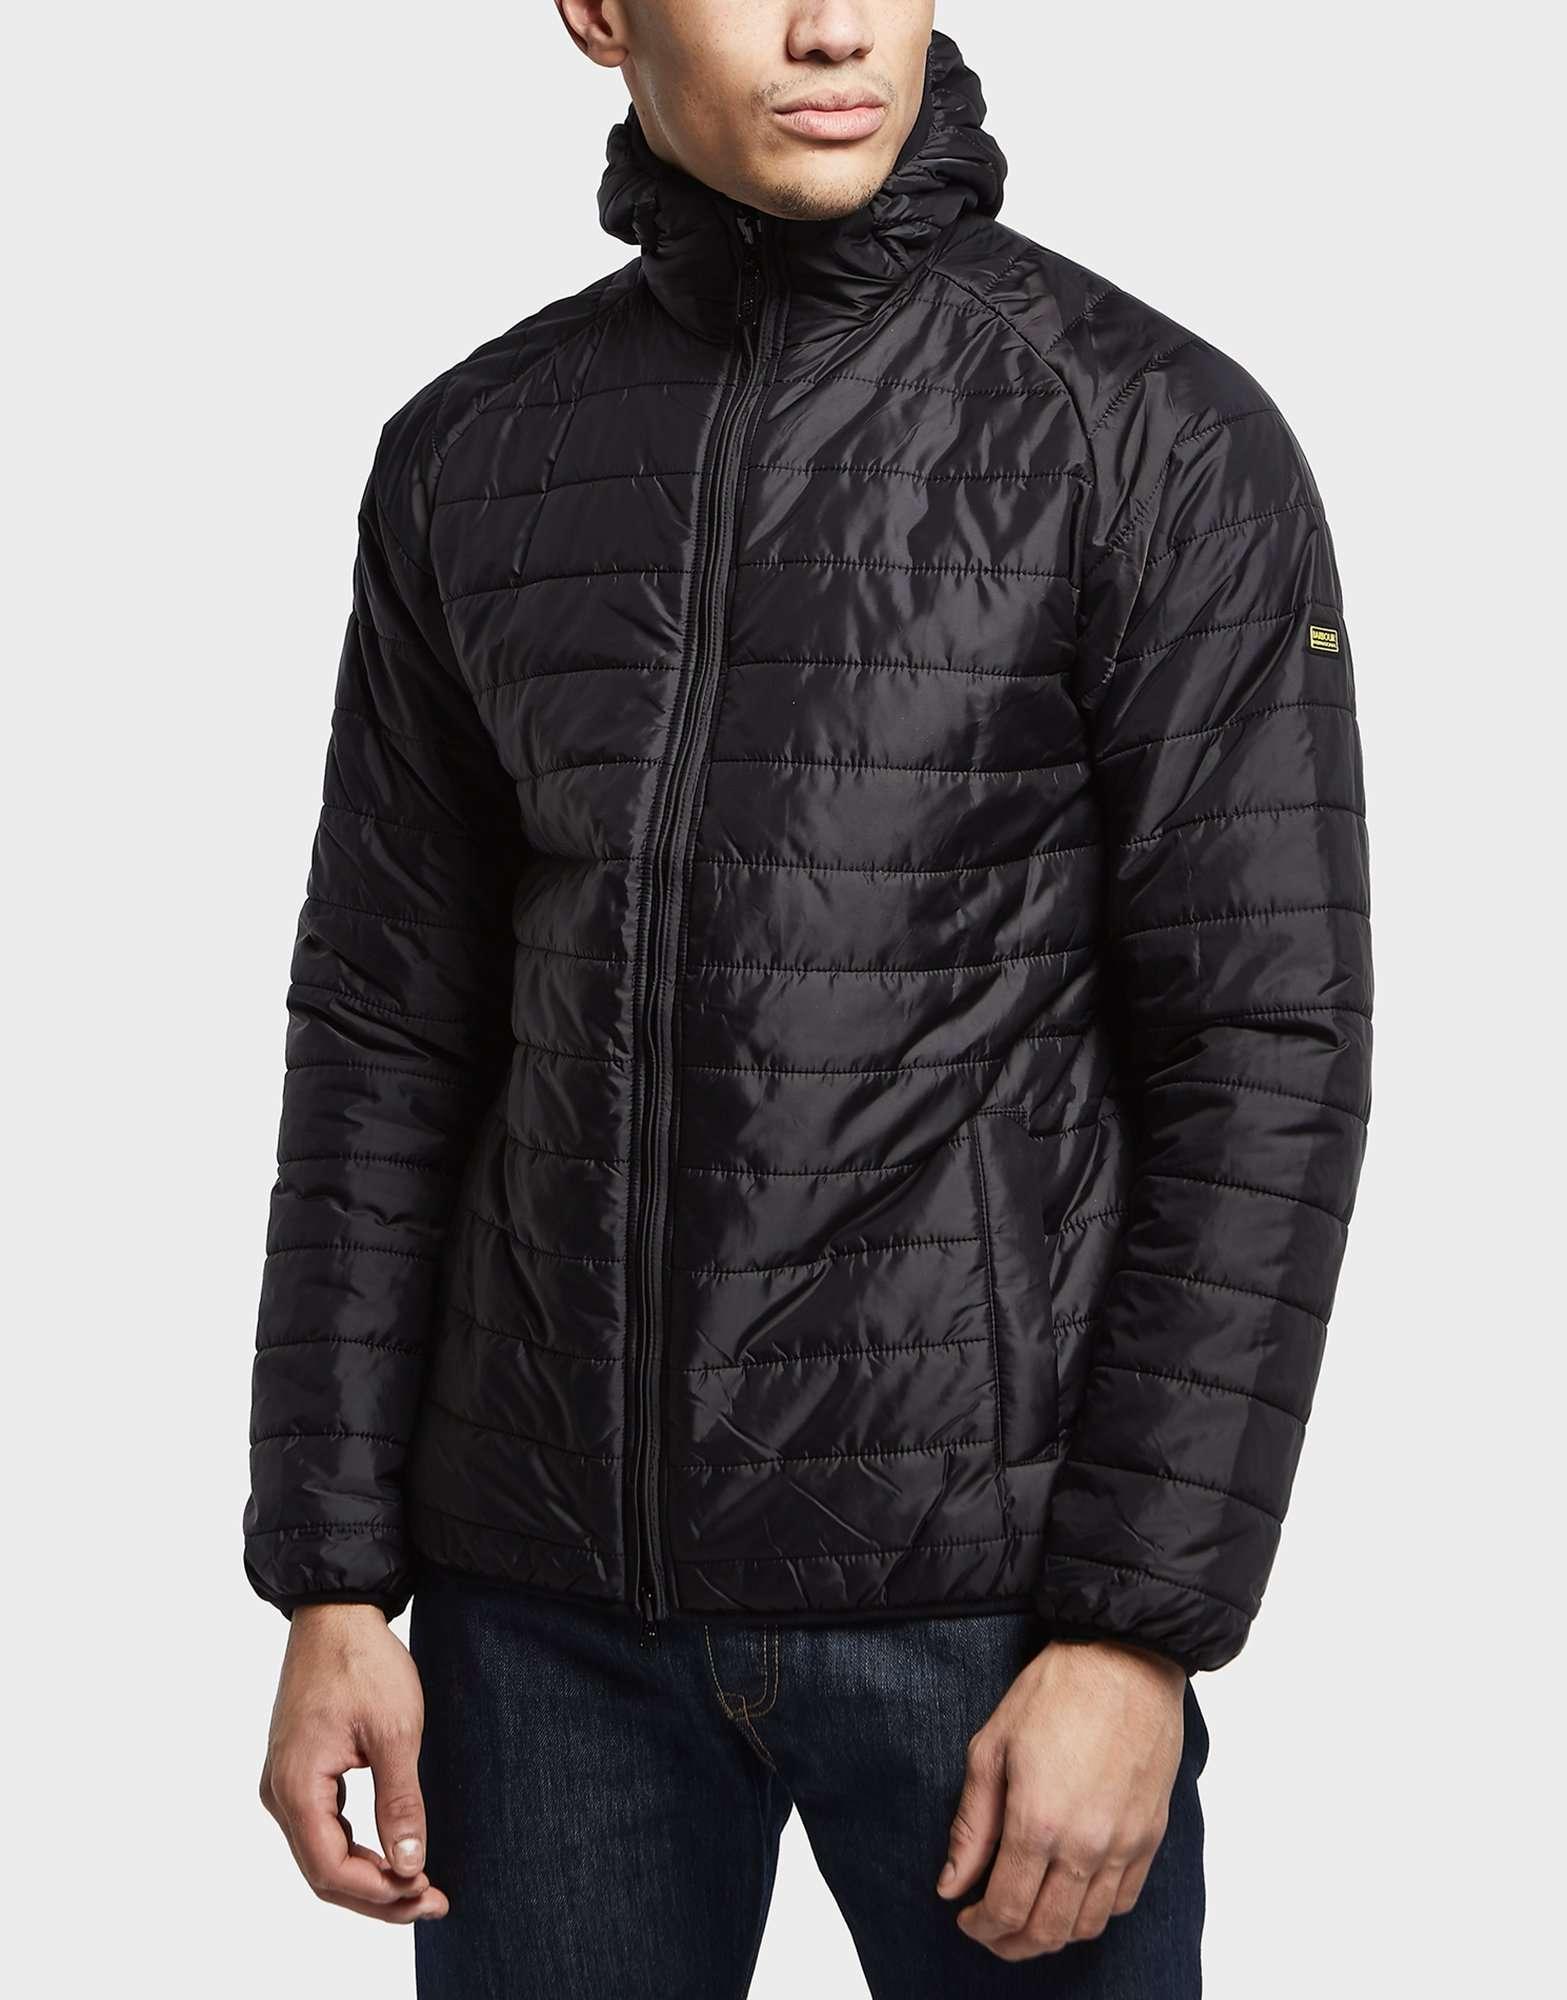 s lauren mens men perry p quilt ellis ralph poly puffer reputation quilted clothing hooded black nylon jacket vest best